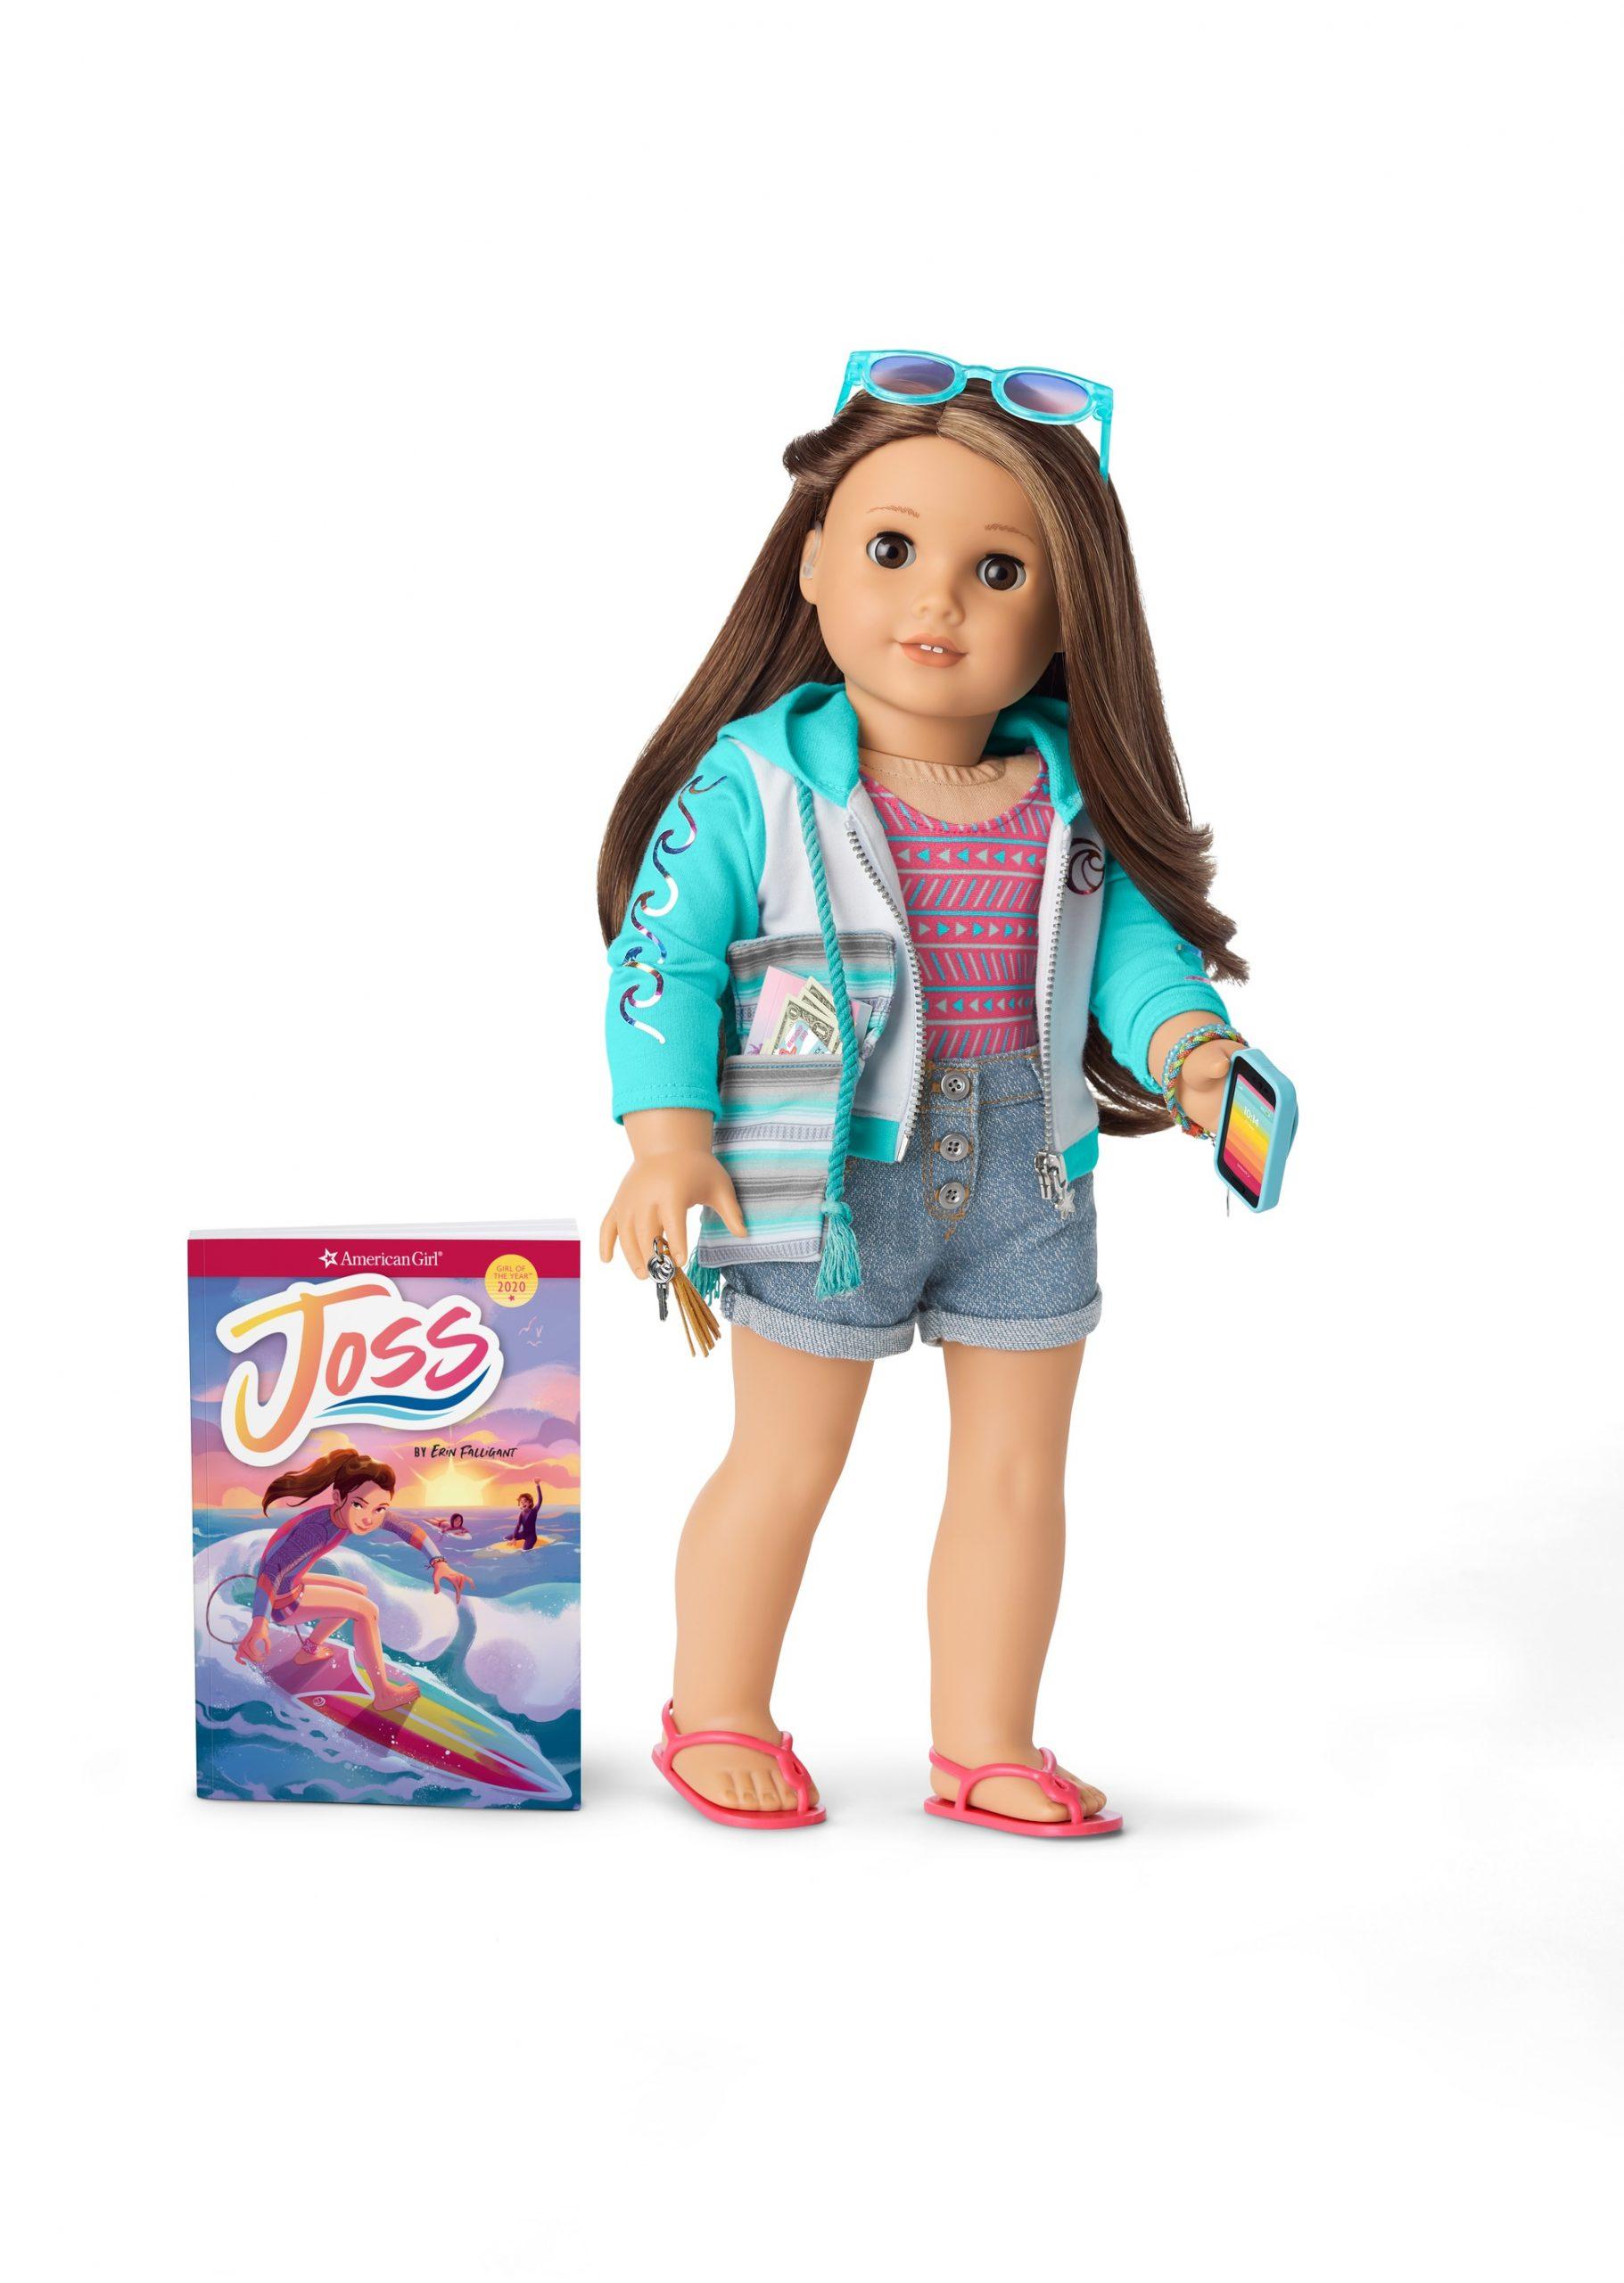 Joss Doll, Book & Accessories